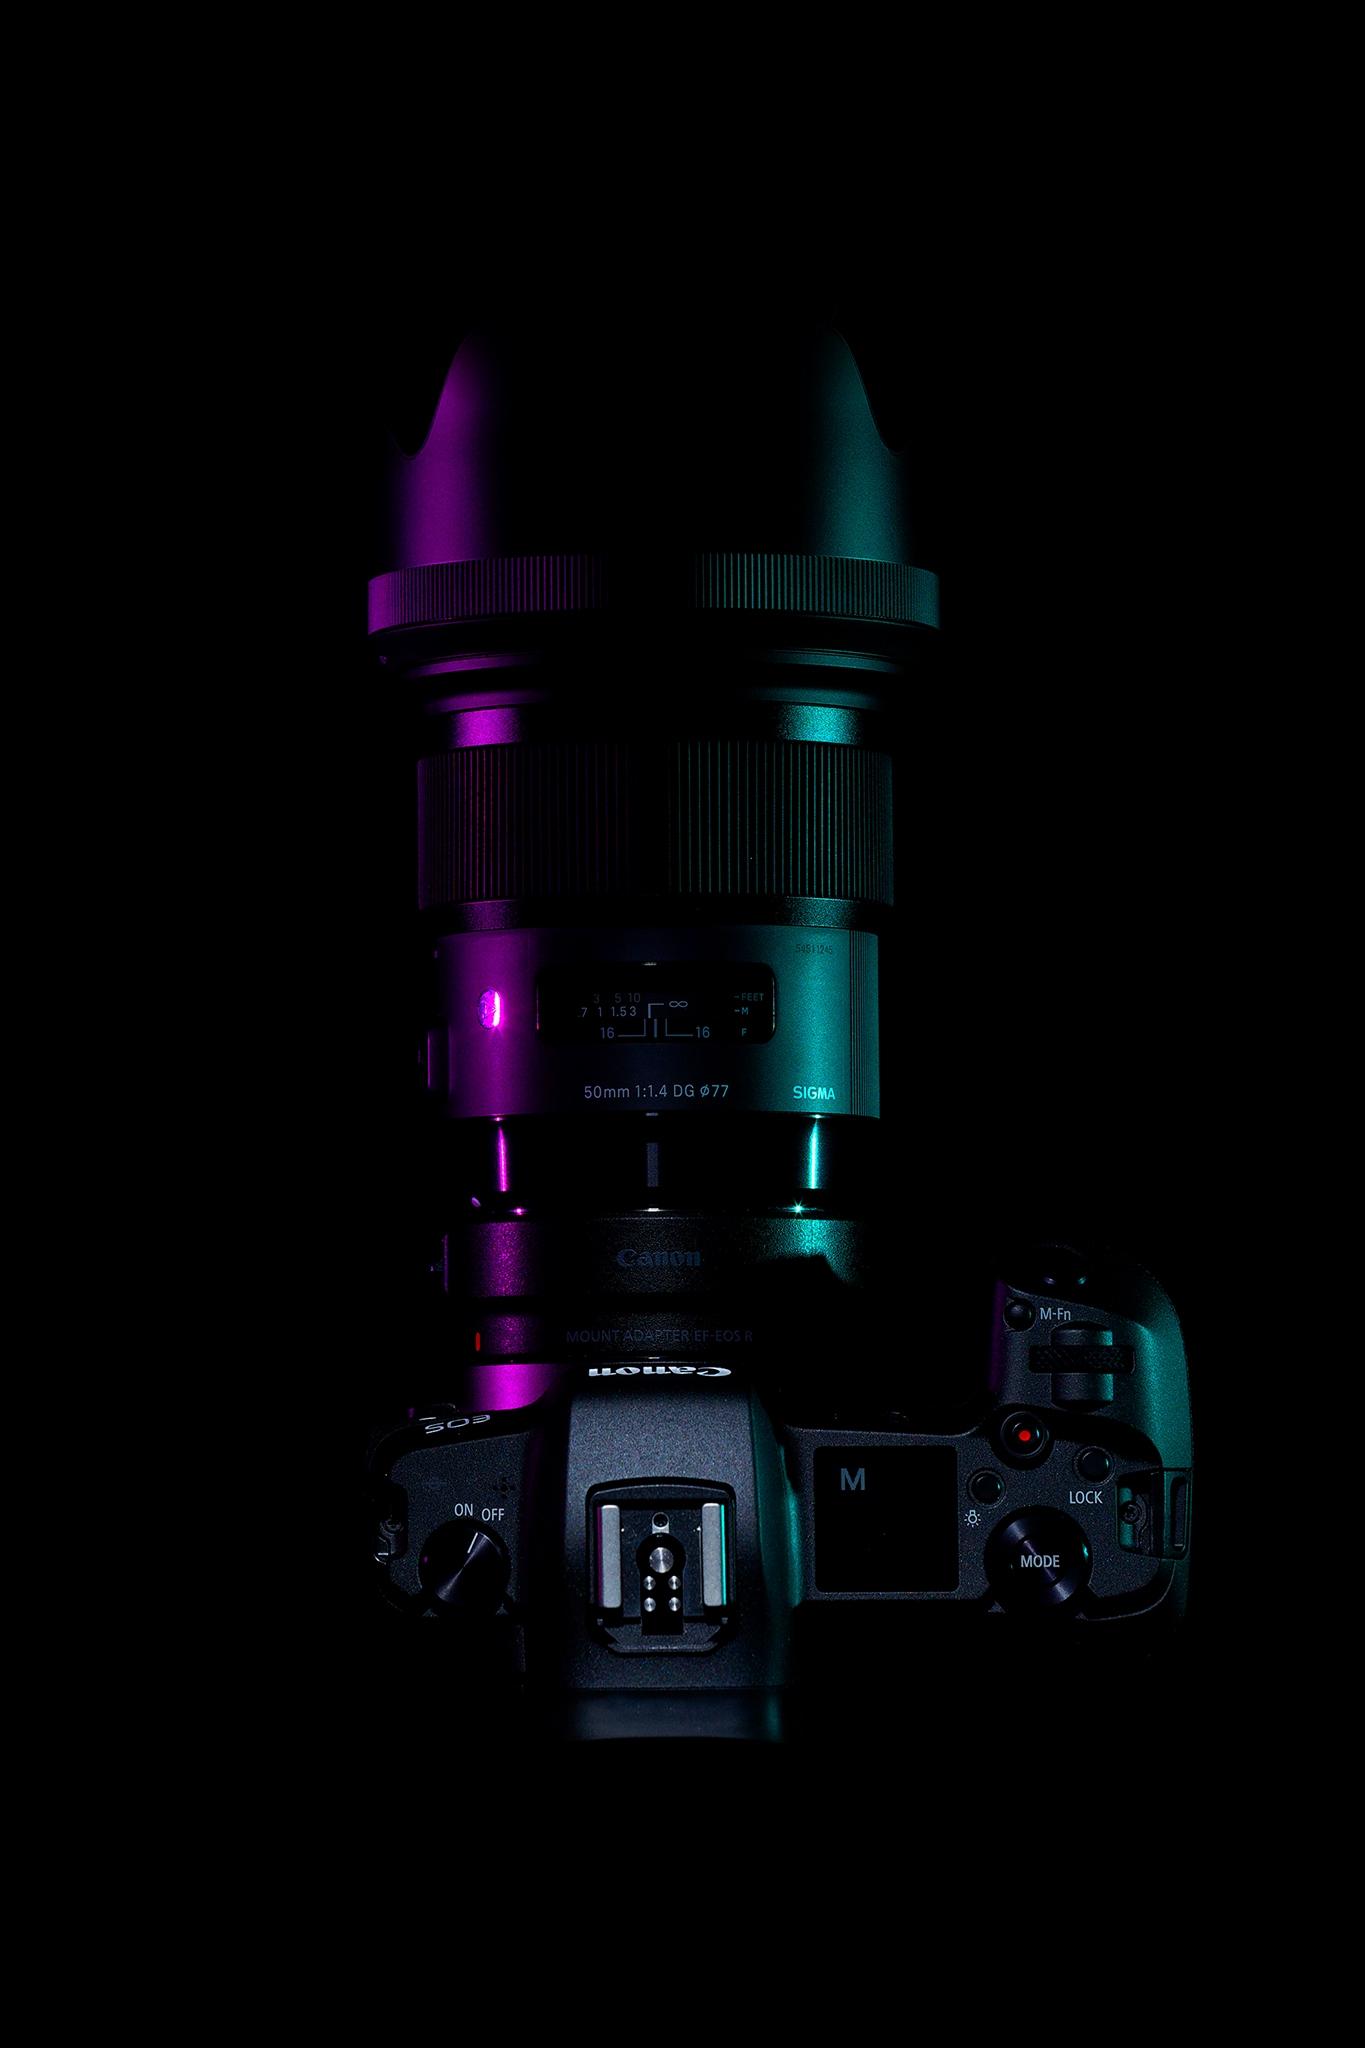 canon eos r eosr sigma sigma50art 500mm f1.4 camera kamera